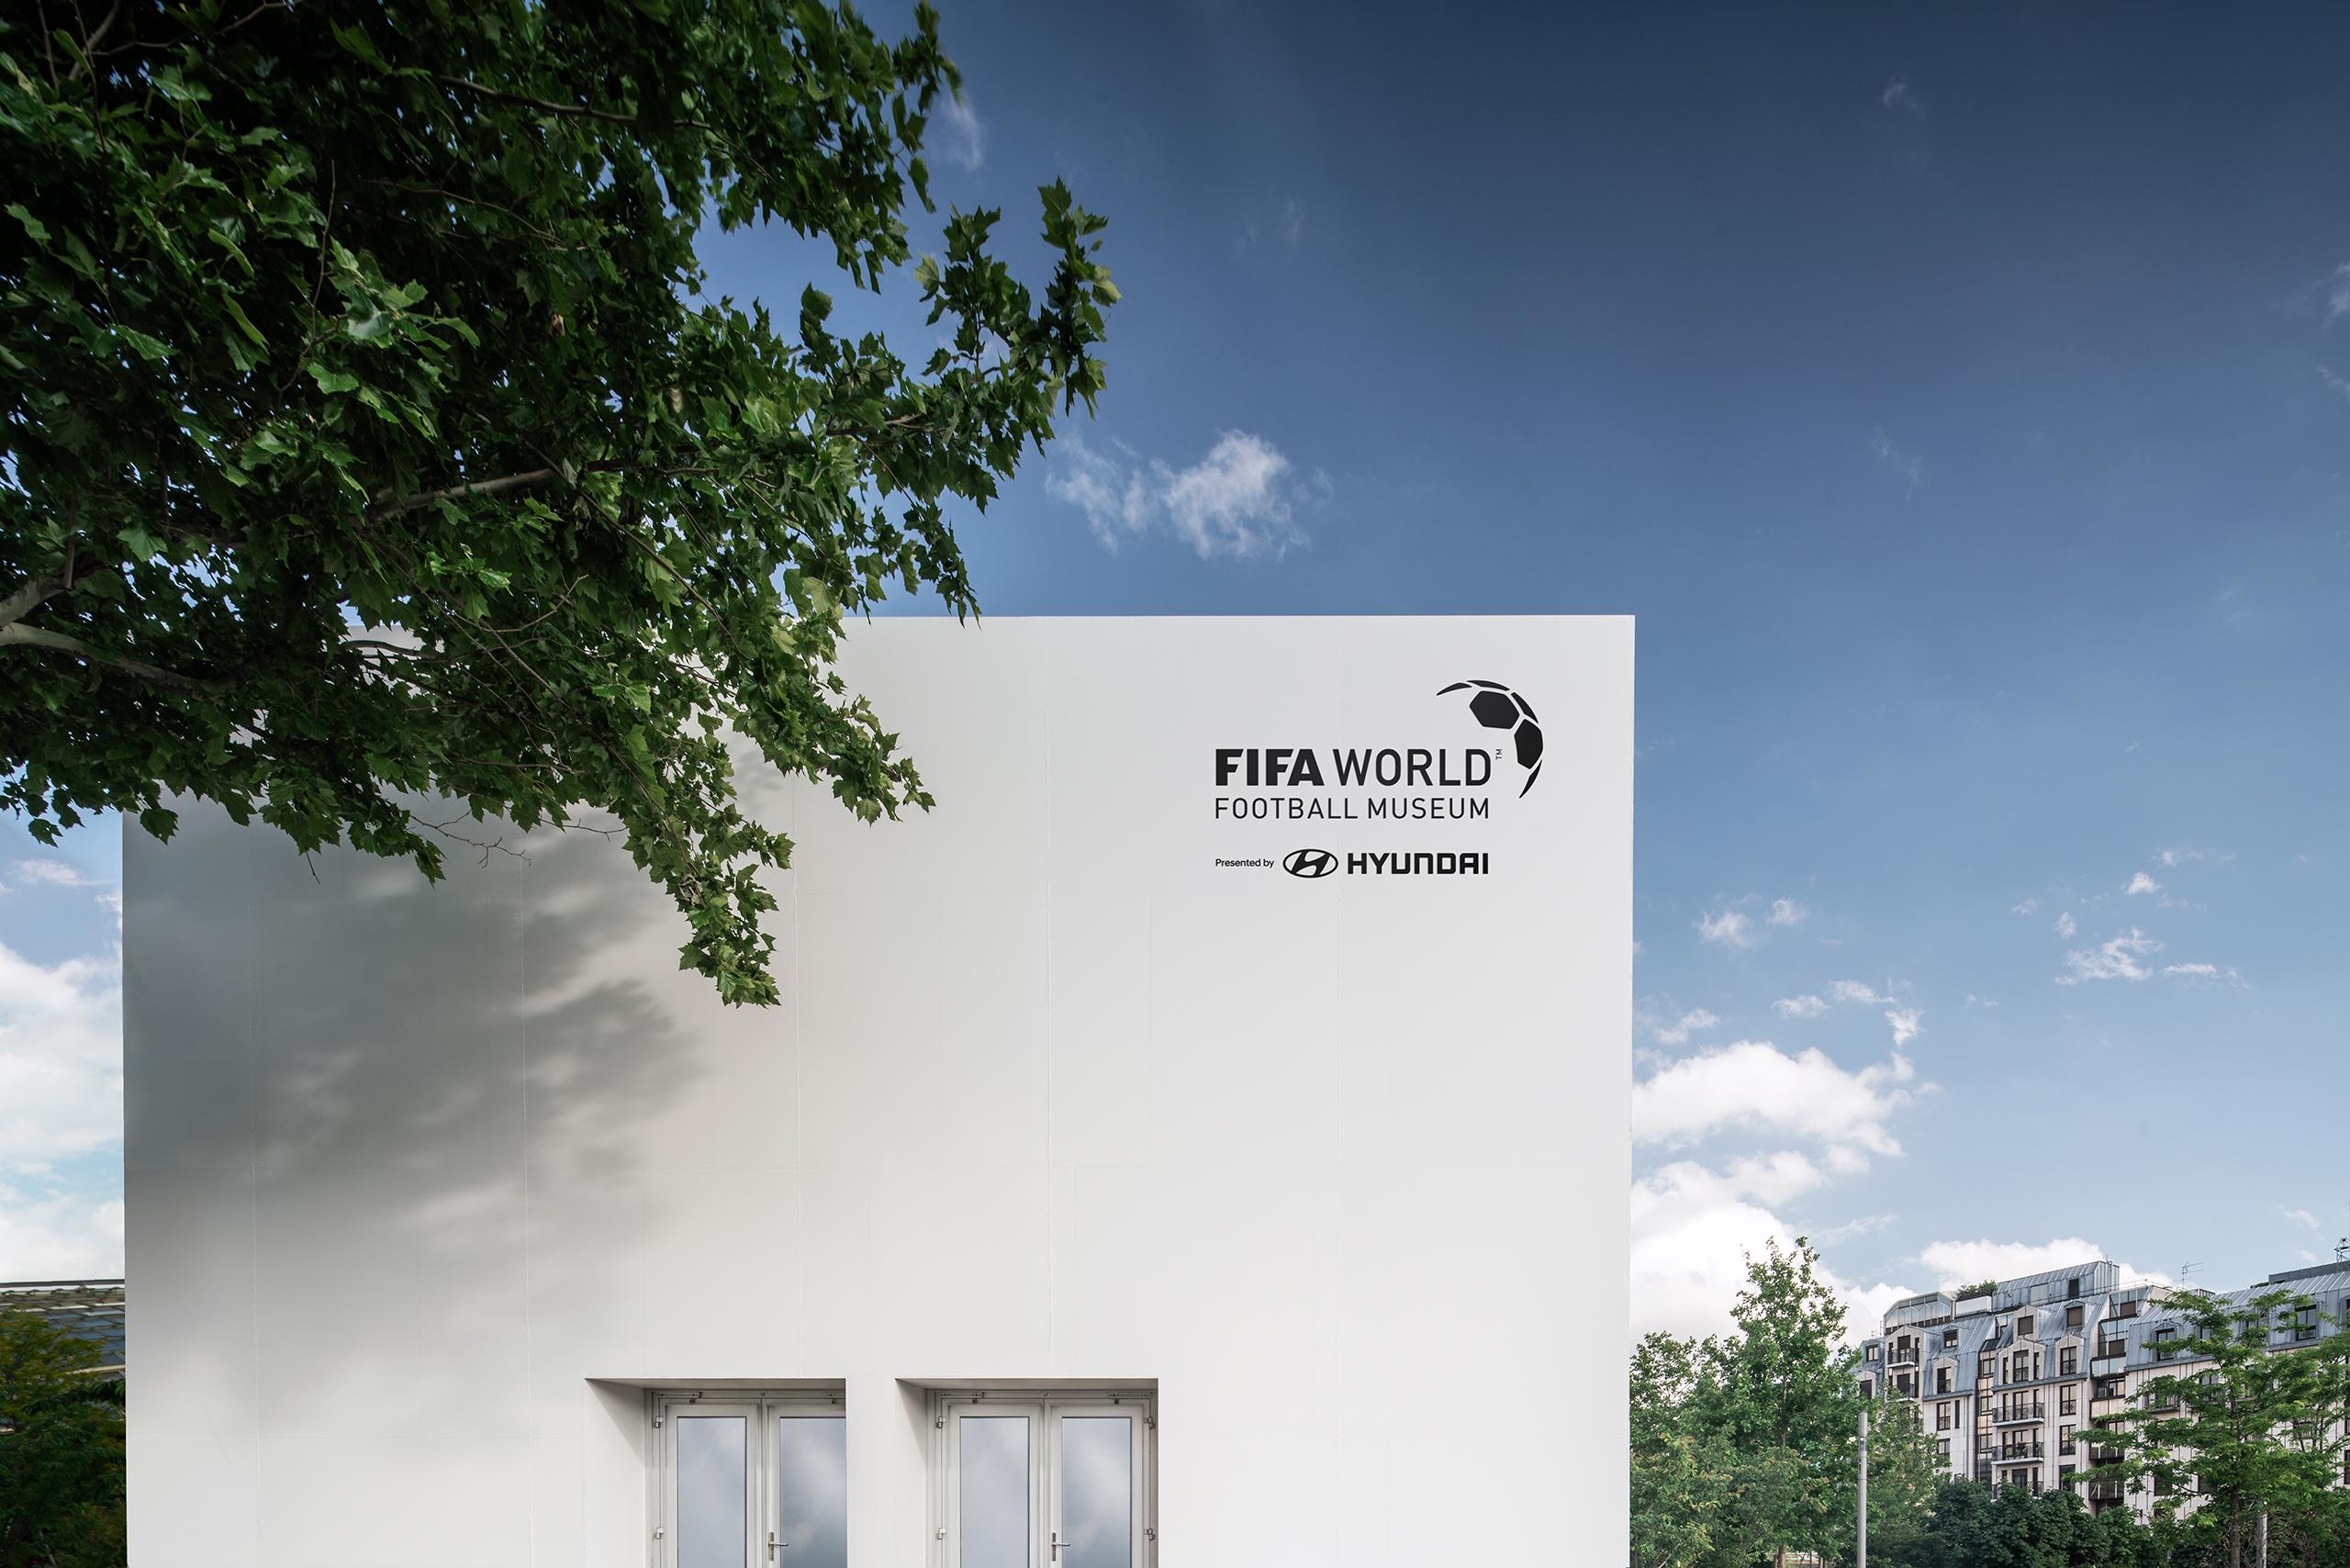 exterior with logo